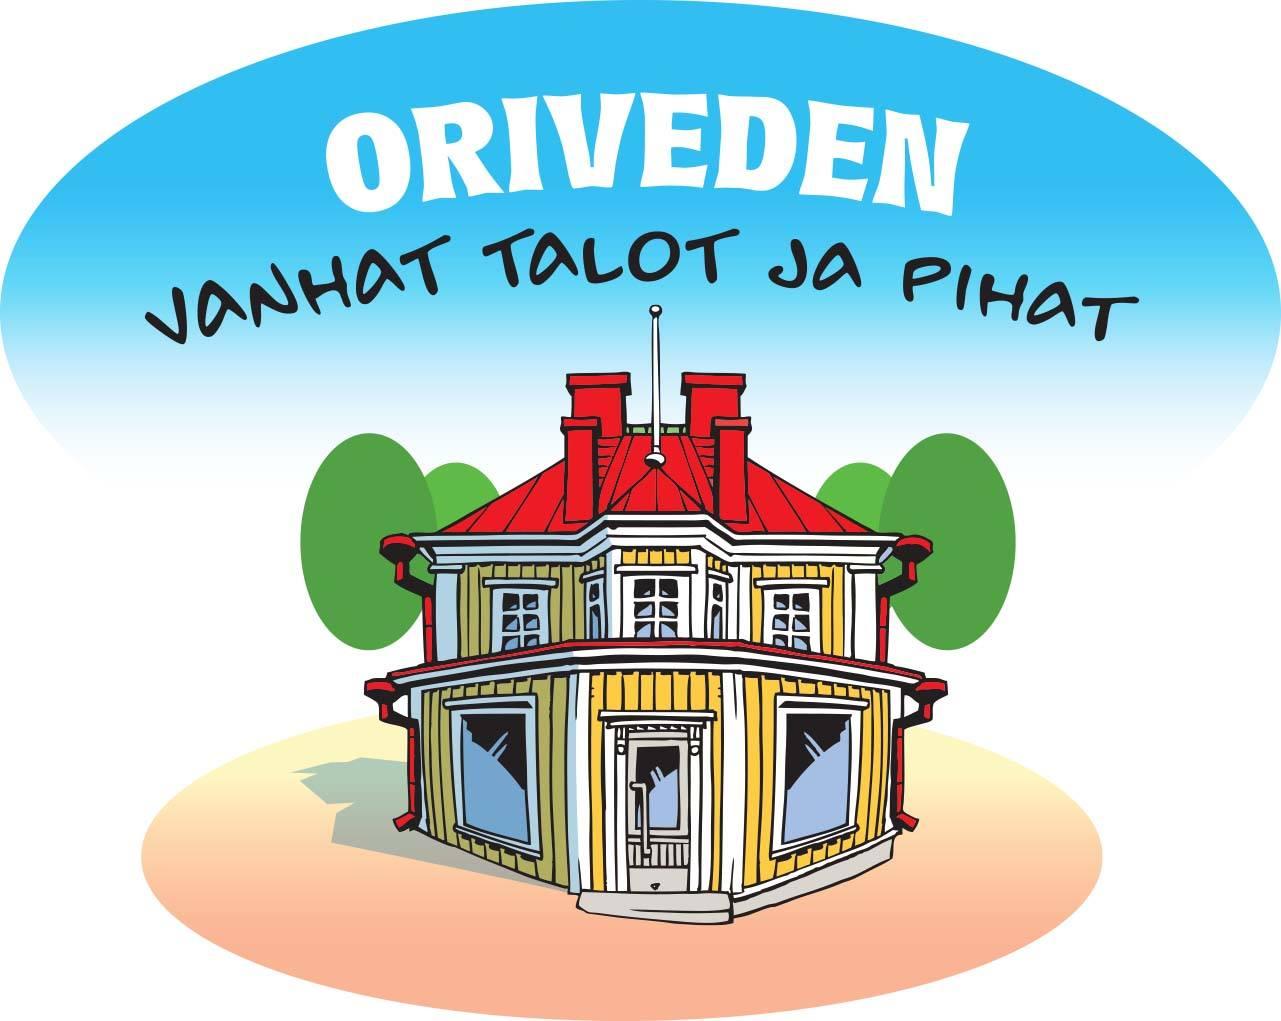 vanhat talot ja pihat -logo